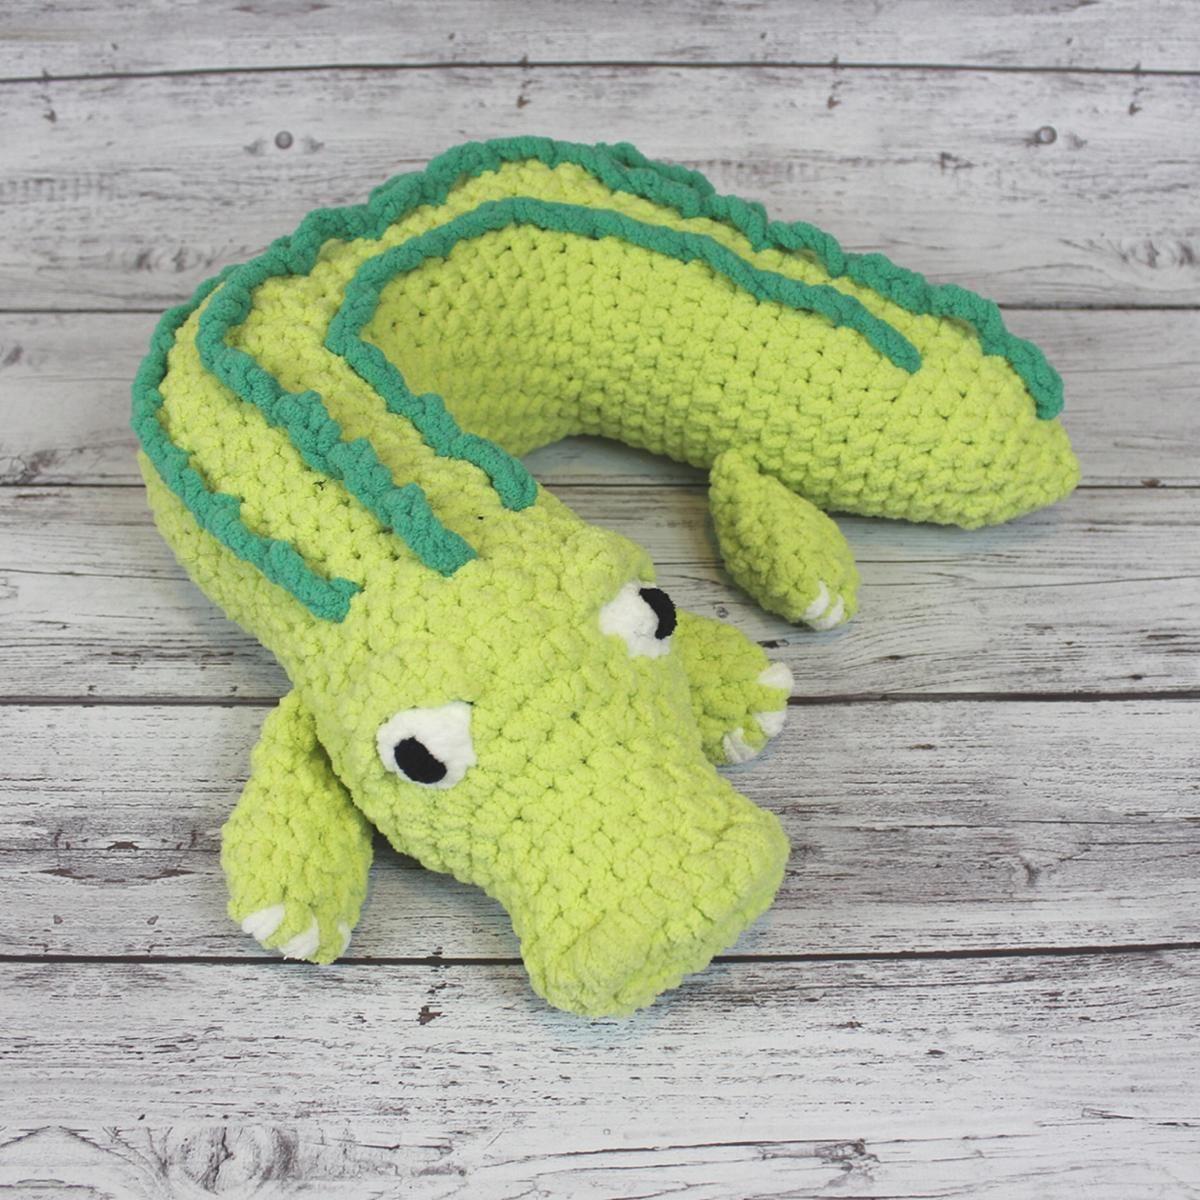 Travel Pillow: Alligator Add-on | Alligators, Pillows and Crochet